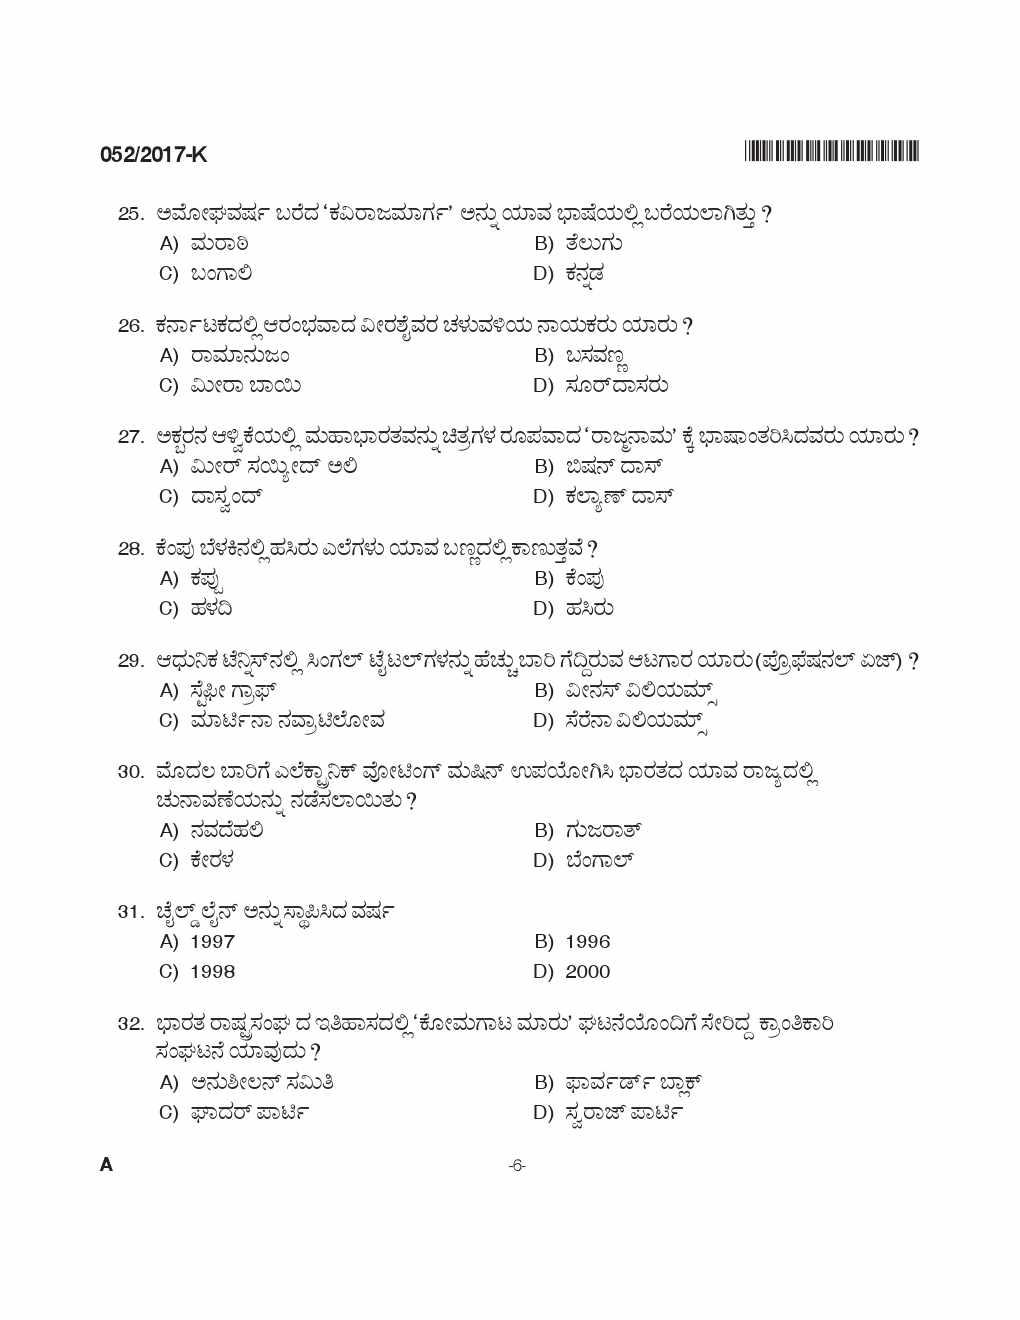 http://masterstudy.net//pdf/psc/women-police-constable-apb-police-question-paper-kannada/q_0522017-k0006.jpg